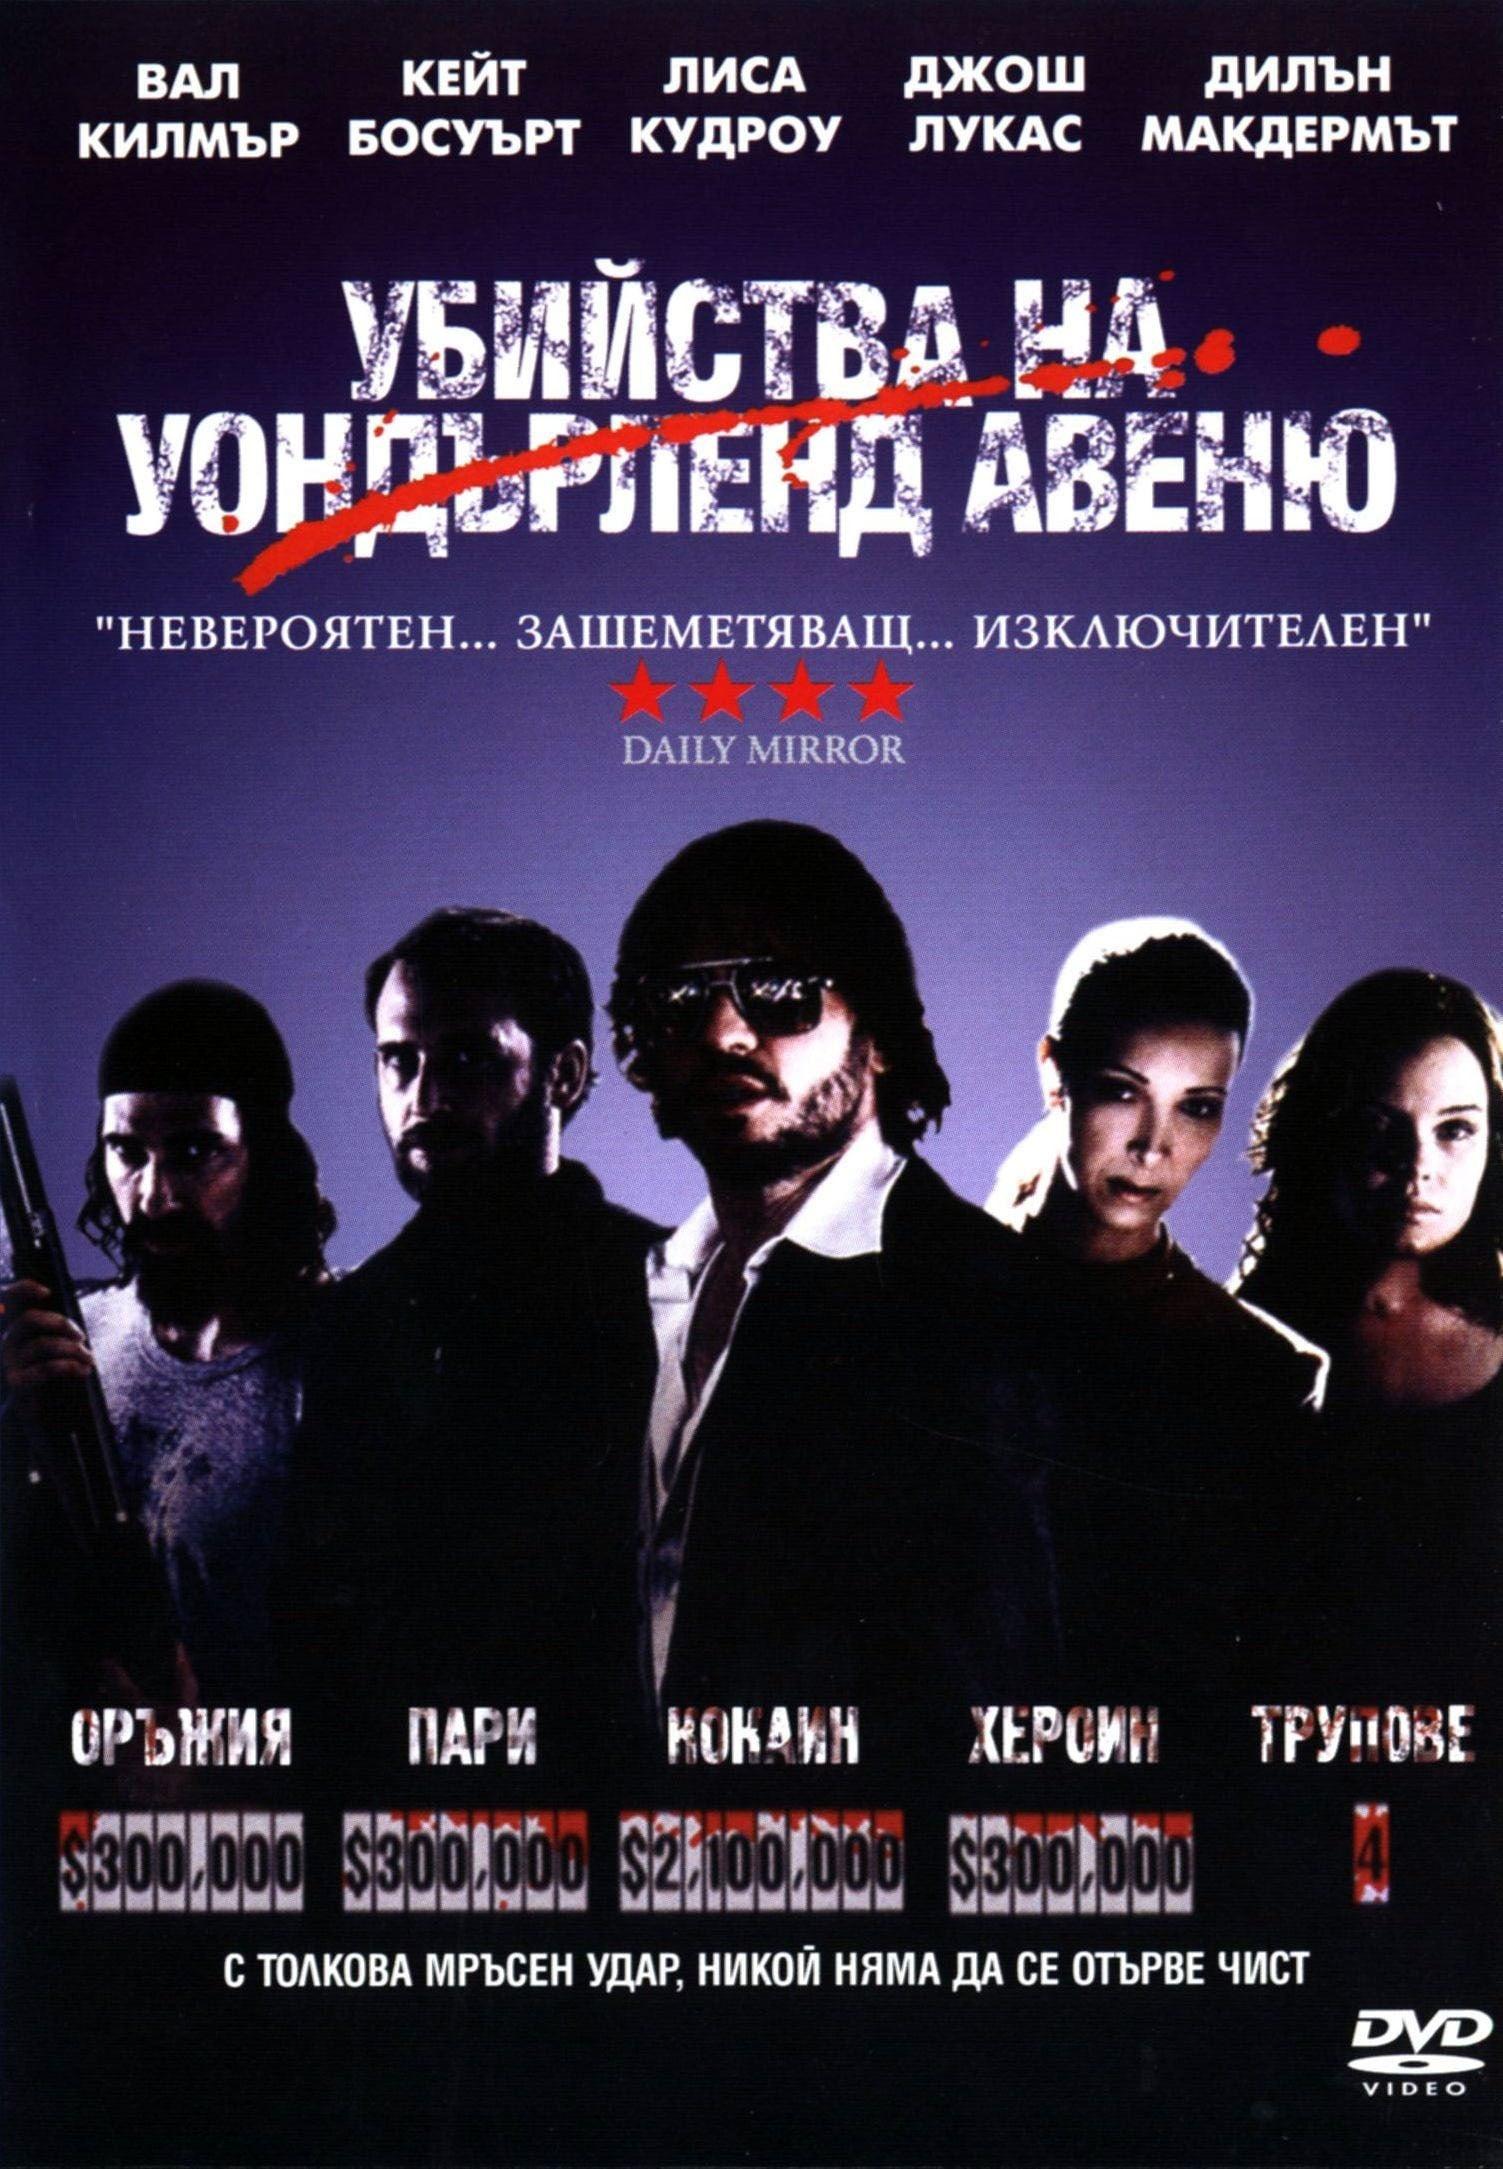 Wonderland 2003 Movie English Subtitle Streaming  Hd Full Movie-9341